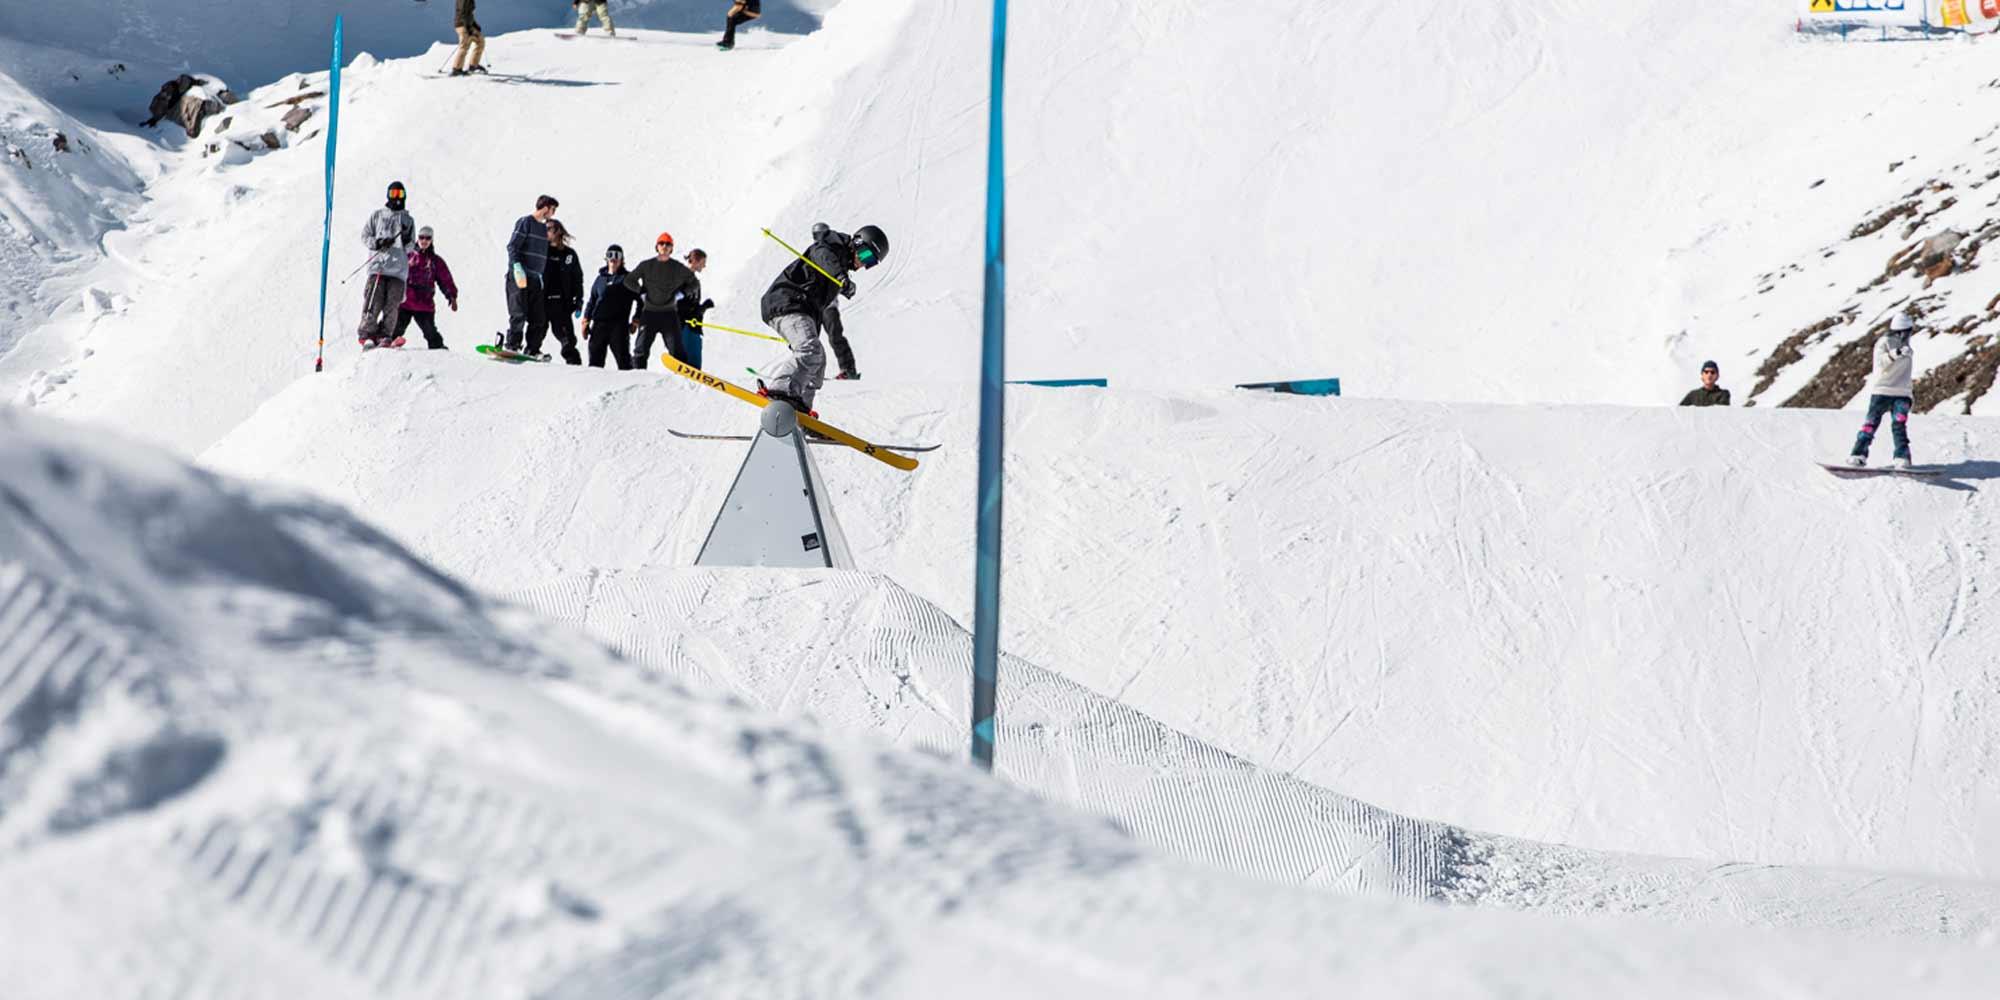 snowpark-kaunertal-kto35-2